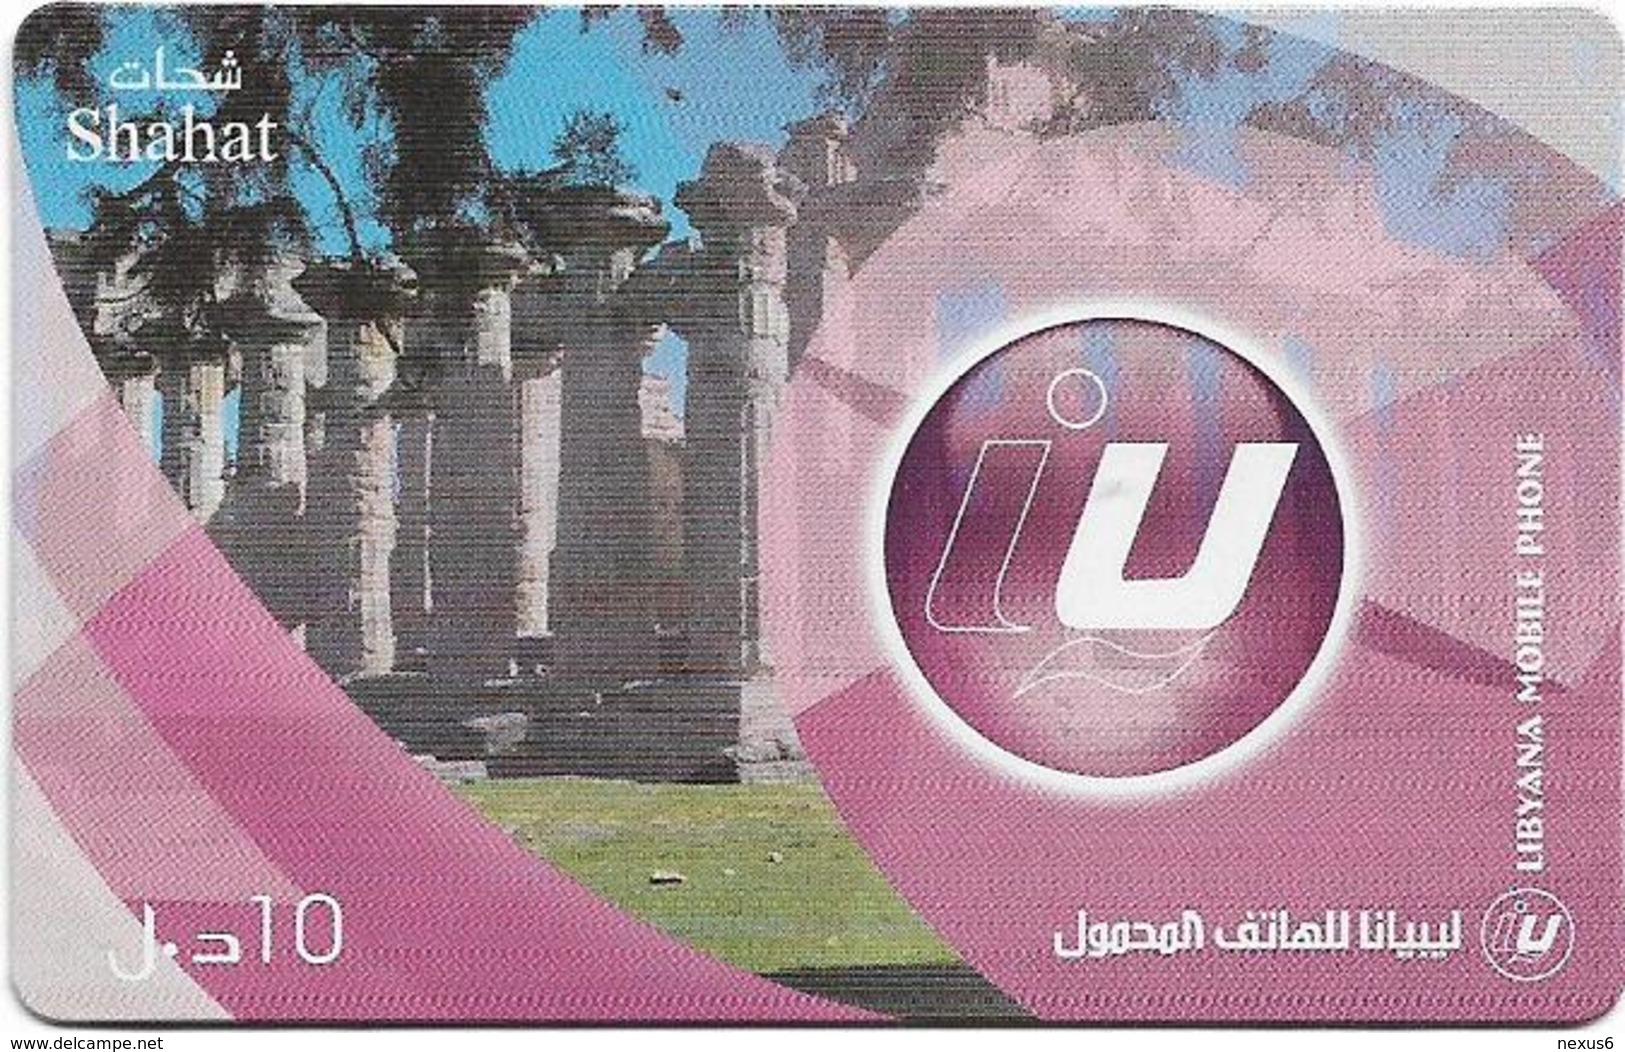 Libya - Libyana - Shahat, 10LD Prepaid Card, Used - Libya